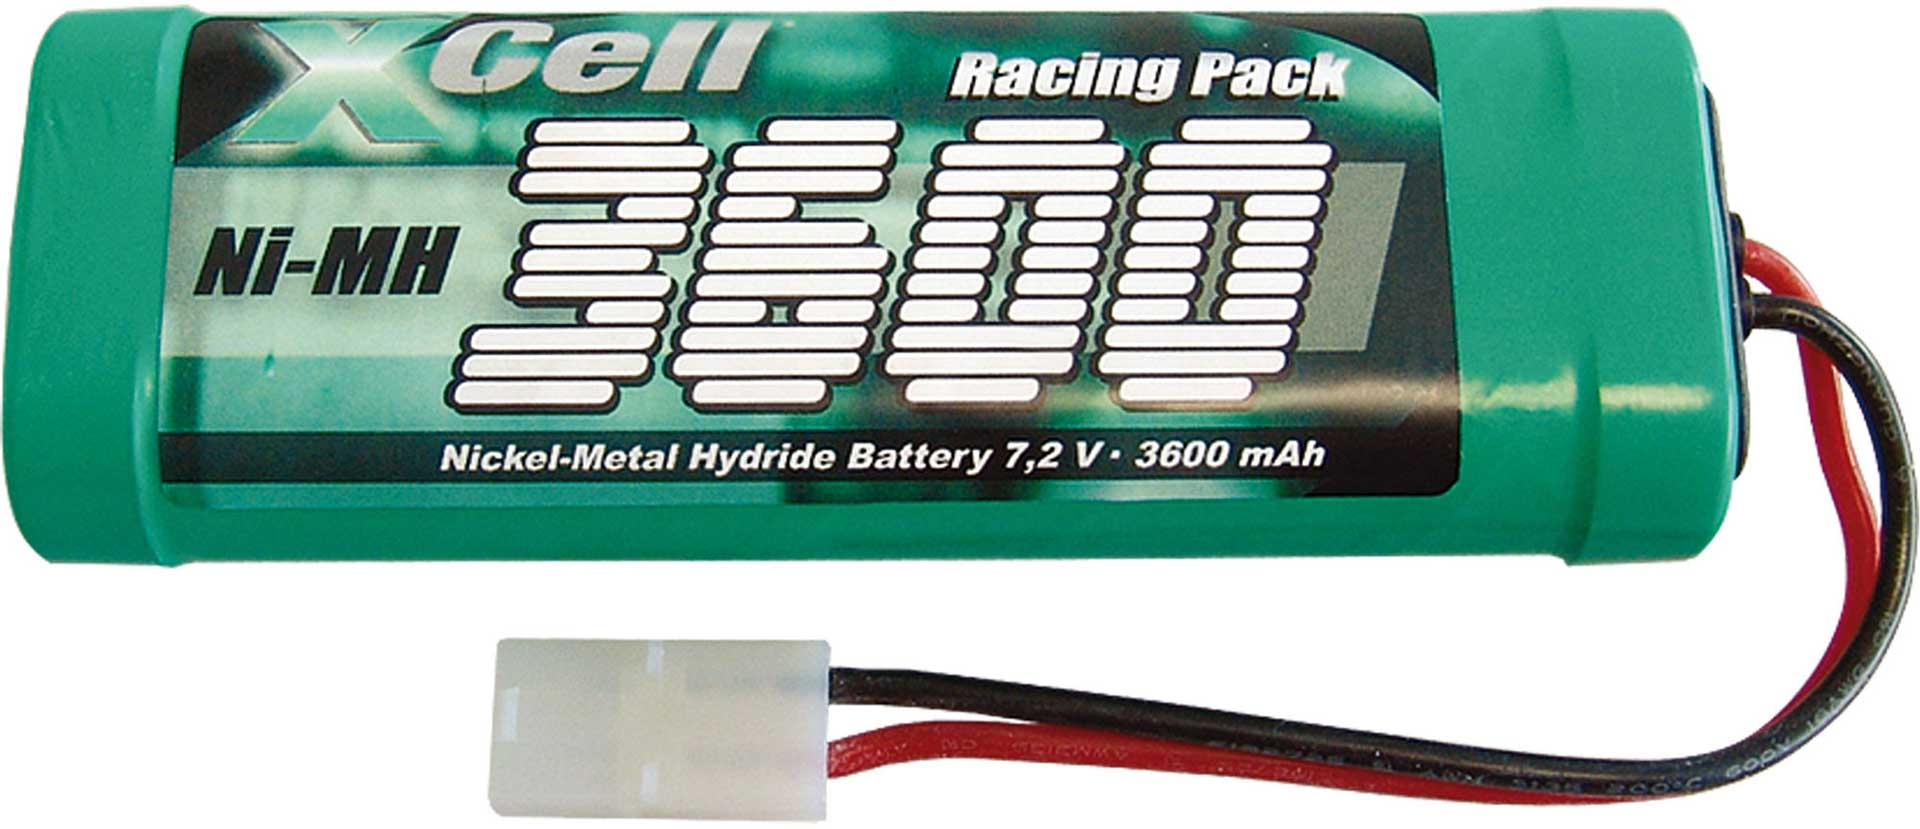 XCELL NI-MH RACINGPACK 3600 MAH 7,2 VOLT